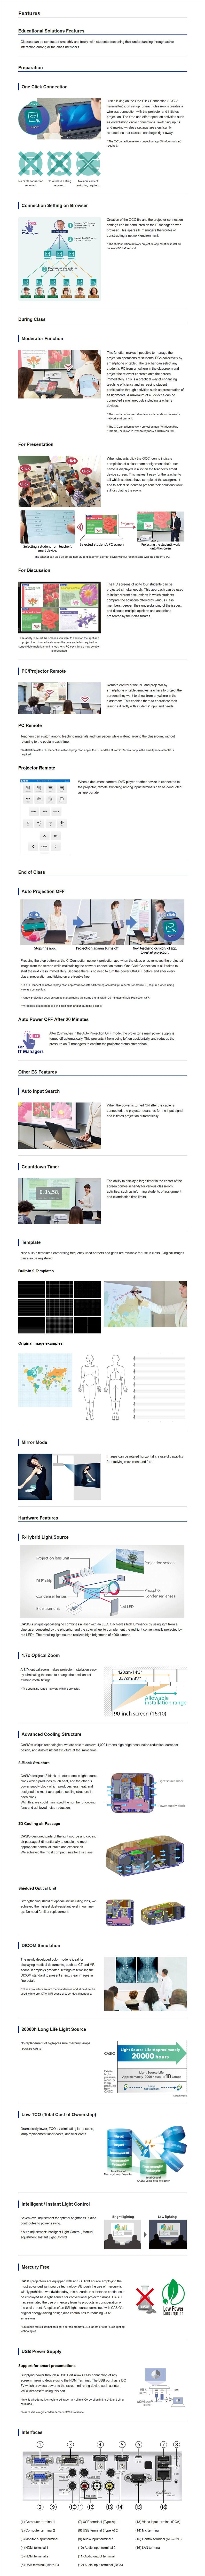 Casio XJ-S400UN Superior WUXGA DLP Projector - Overview 1